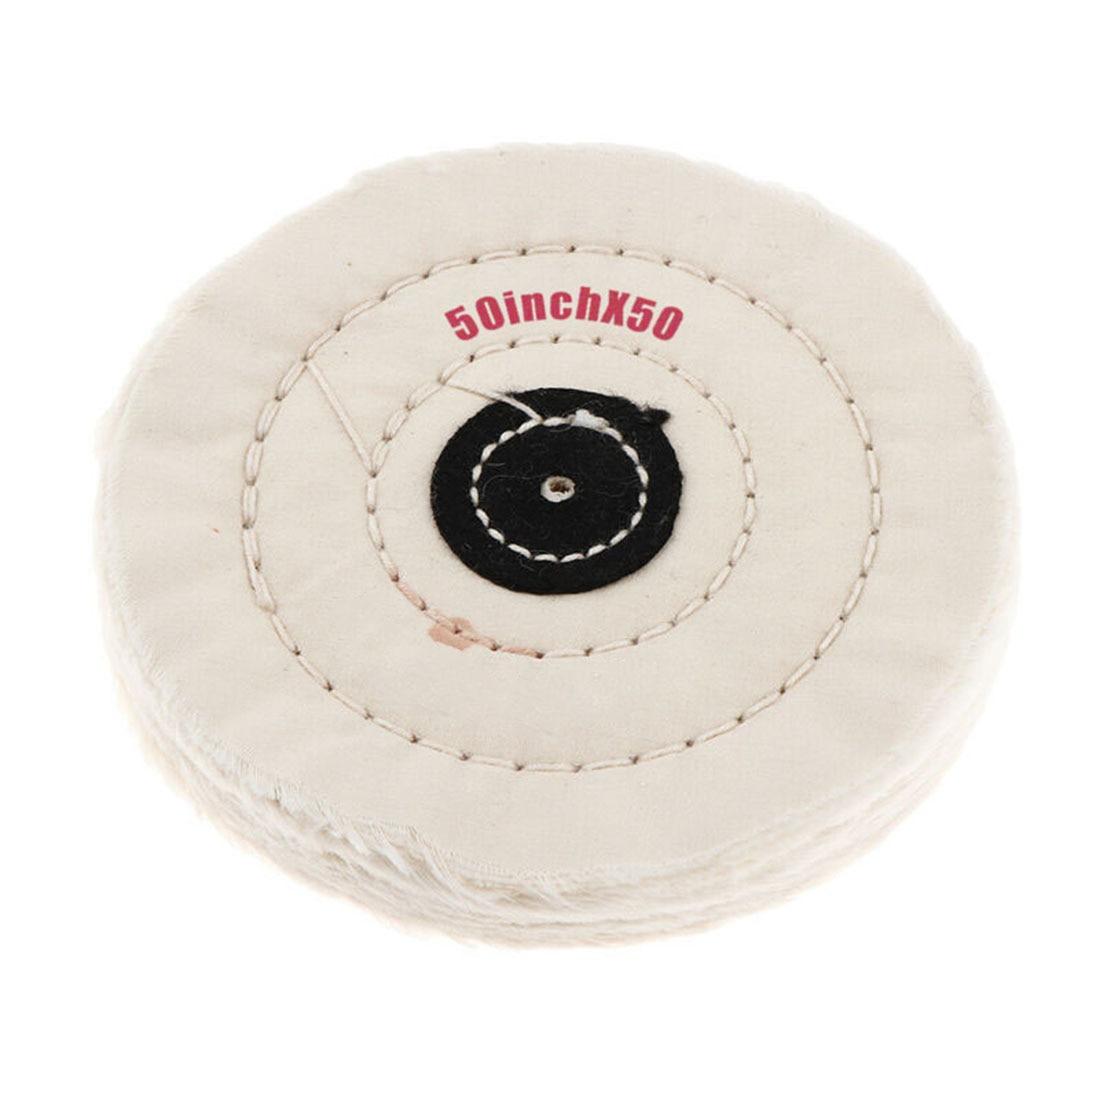 1pc Cotton Polishing Wheel Cloth Buffing Wheel Pad Polishing Jewelry 5 Inch Buffer Mirror Polish Wheel 50 Layers Abrasive Tools